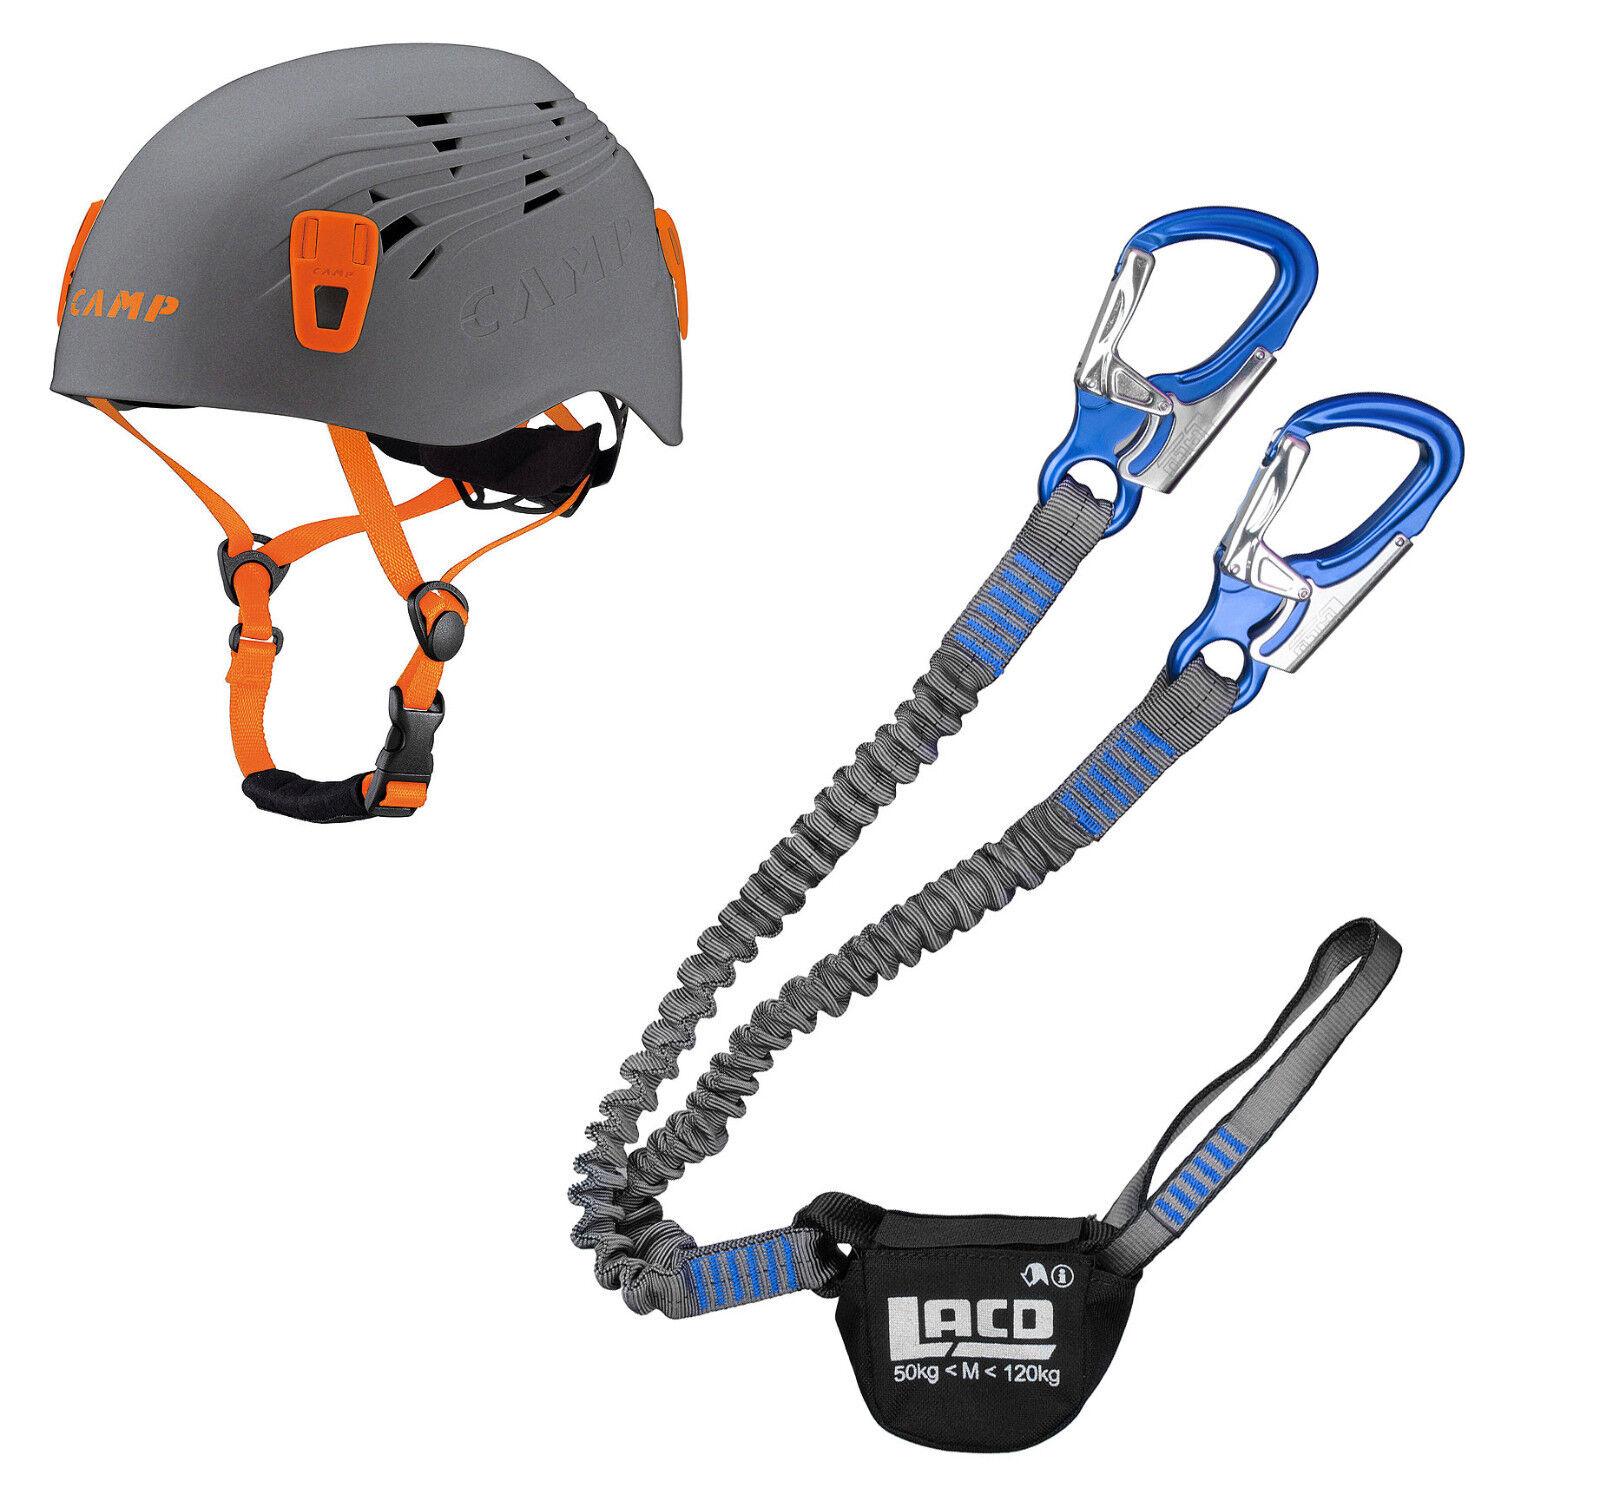 Klettersteigset Klettersteigset Klettersteigset LACd Pro Evo Blau + Kletter-Helm Camp Titan grau c6c7ea